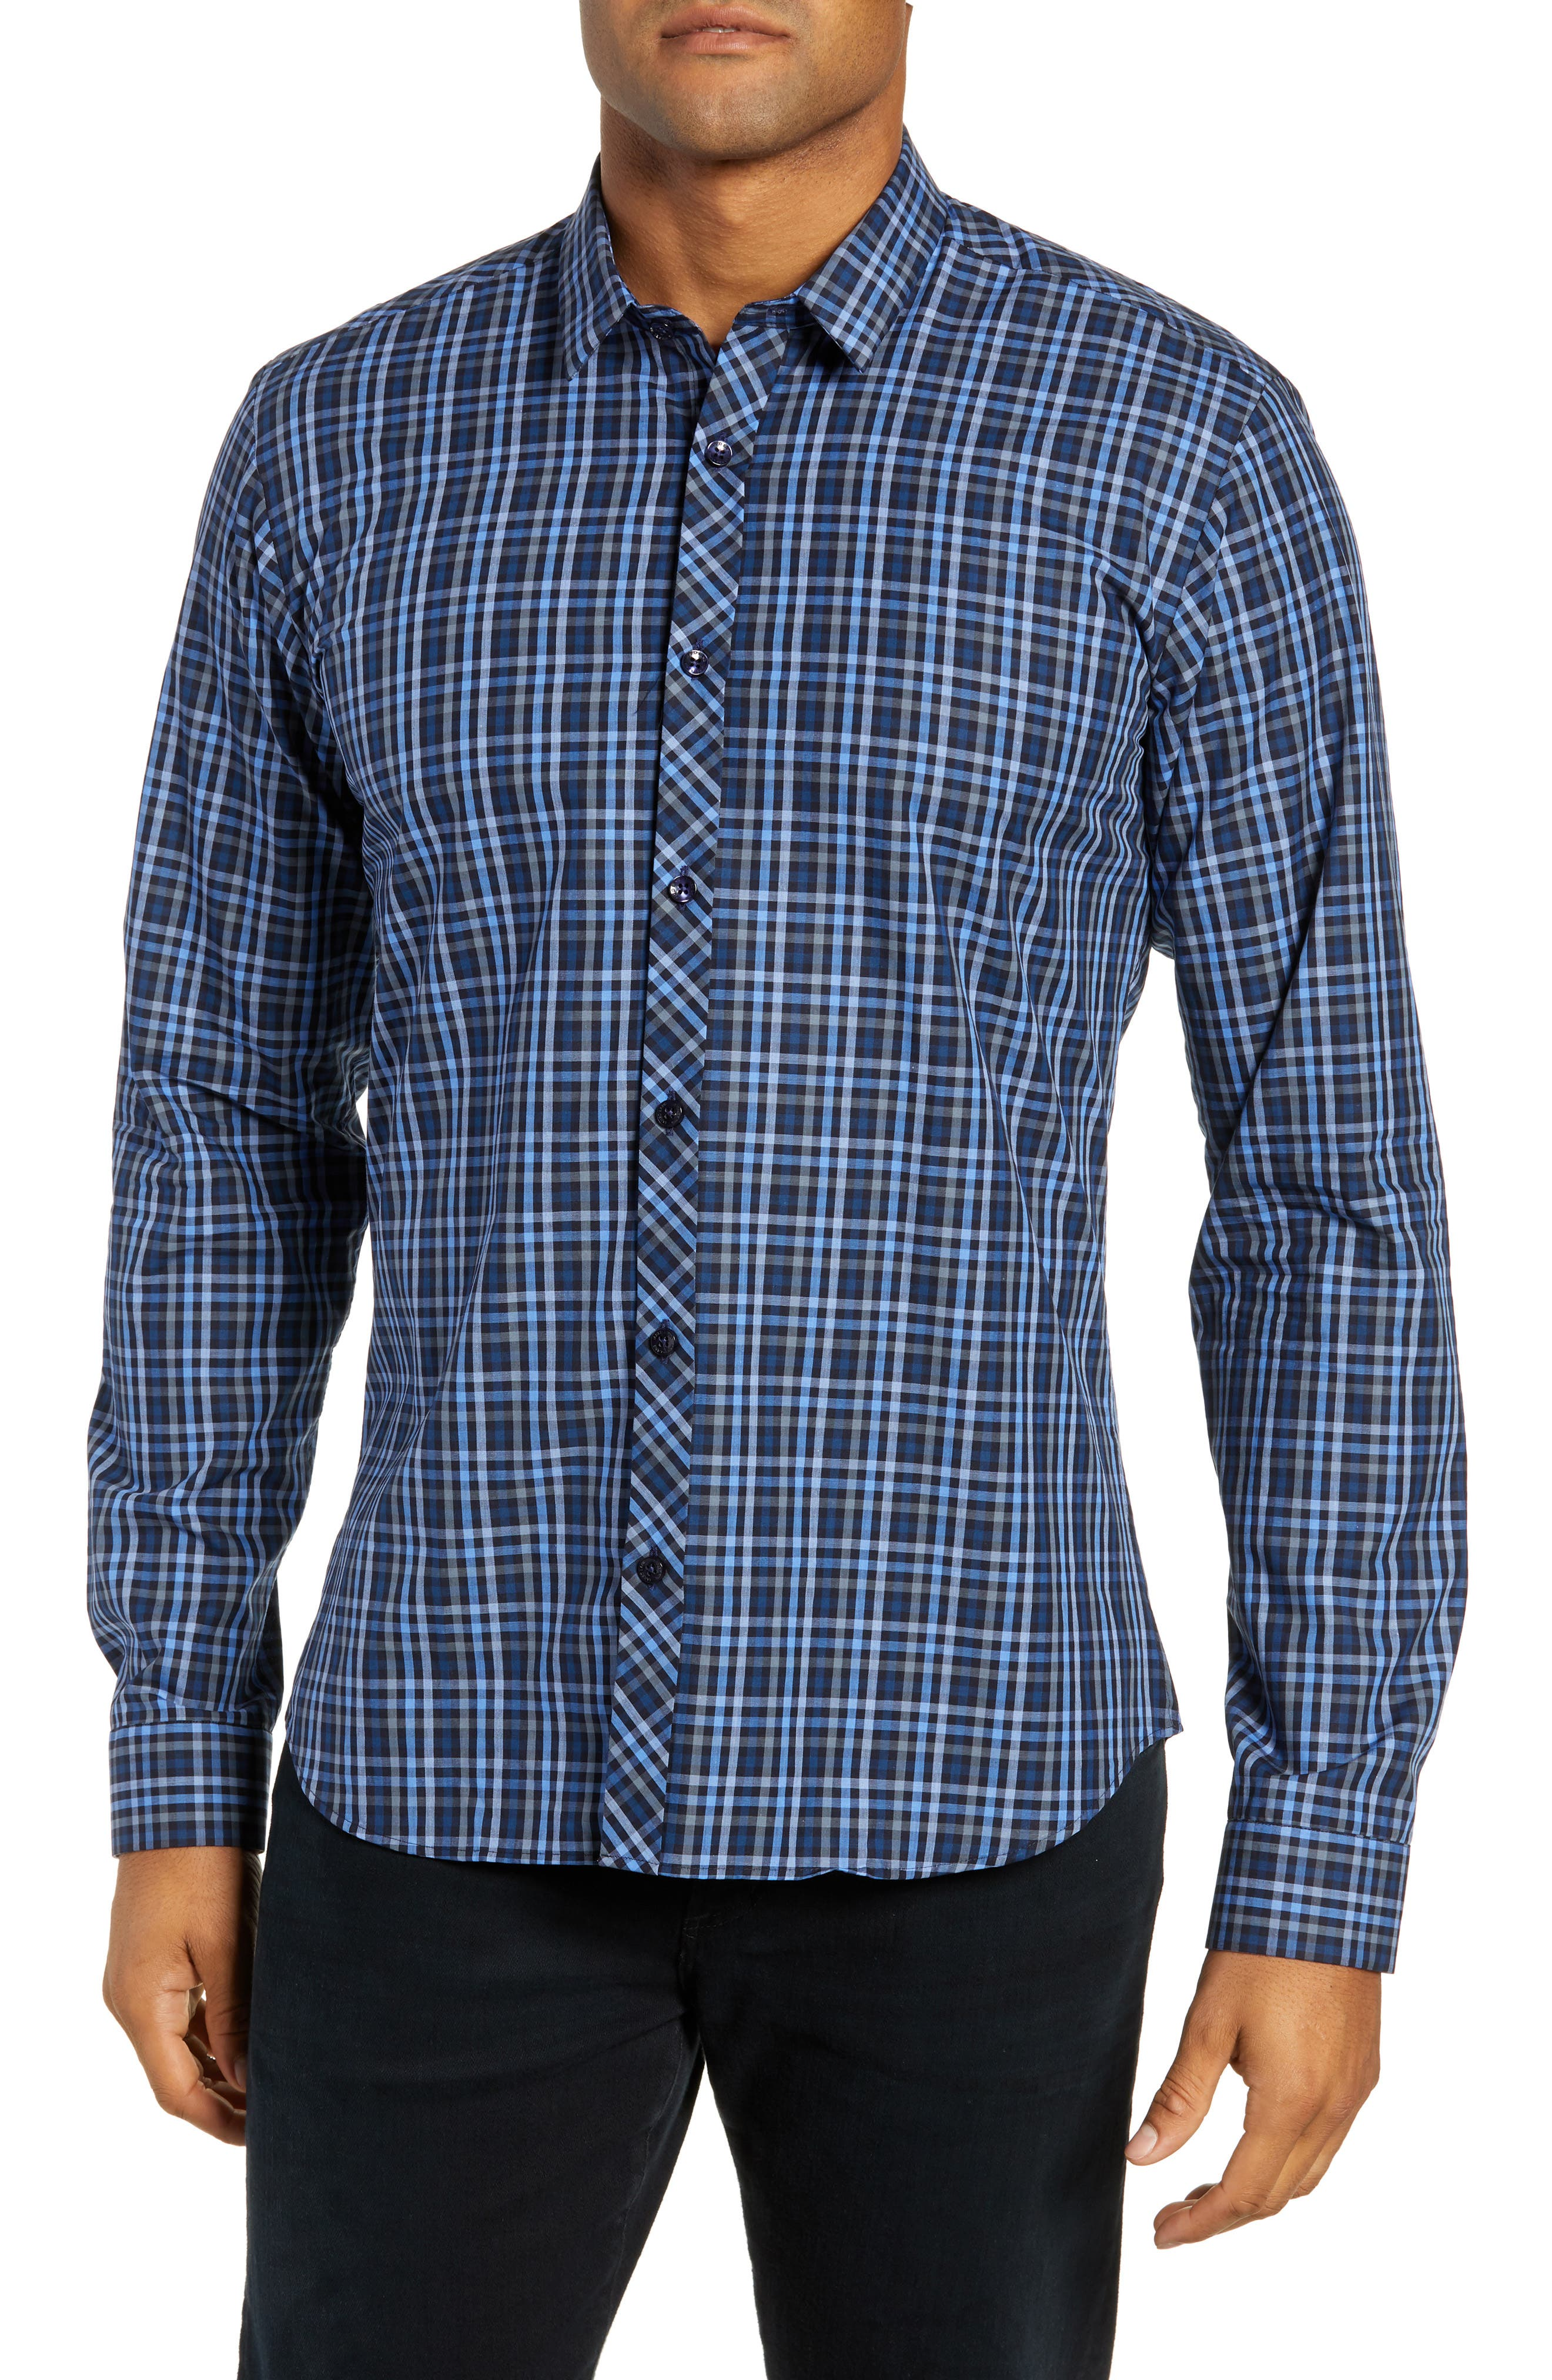 Trim Fit Sport Shirt,                             Main thumbnail 1, color,                             NAVY - BLUE MULTI CHECK